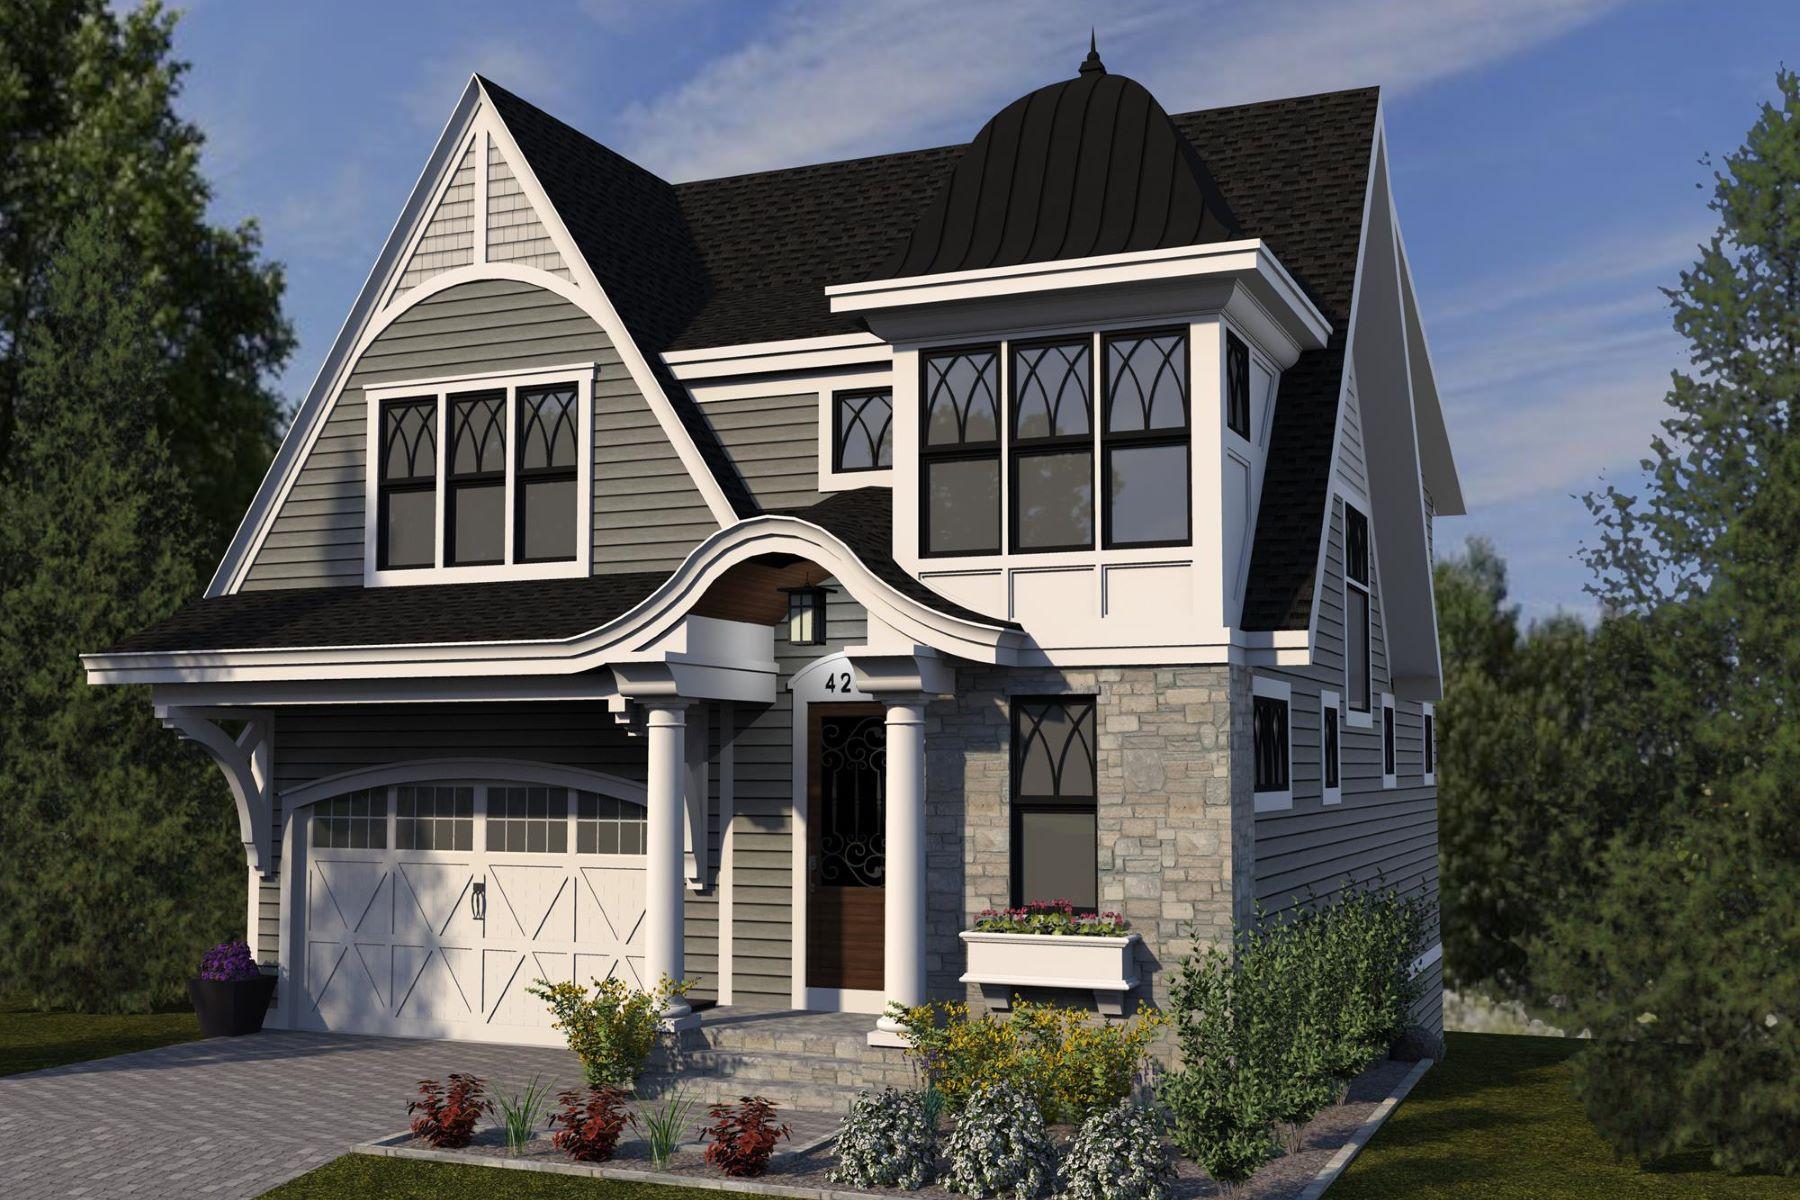 Single Family Home for Sale at 4230 Crocker Avenue Edina, Minnesota, 55416 United States